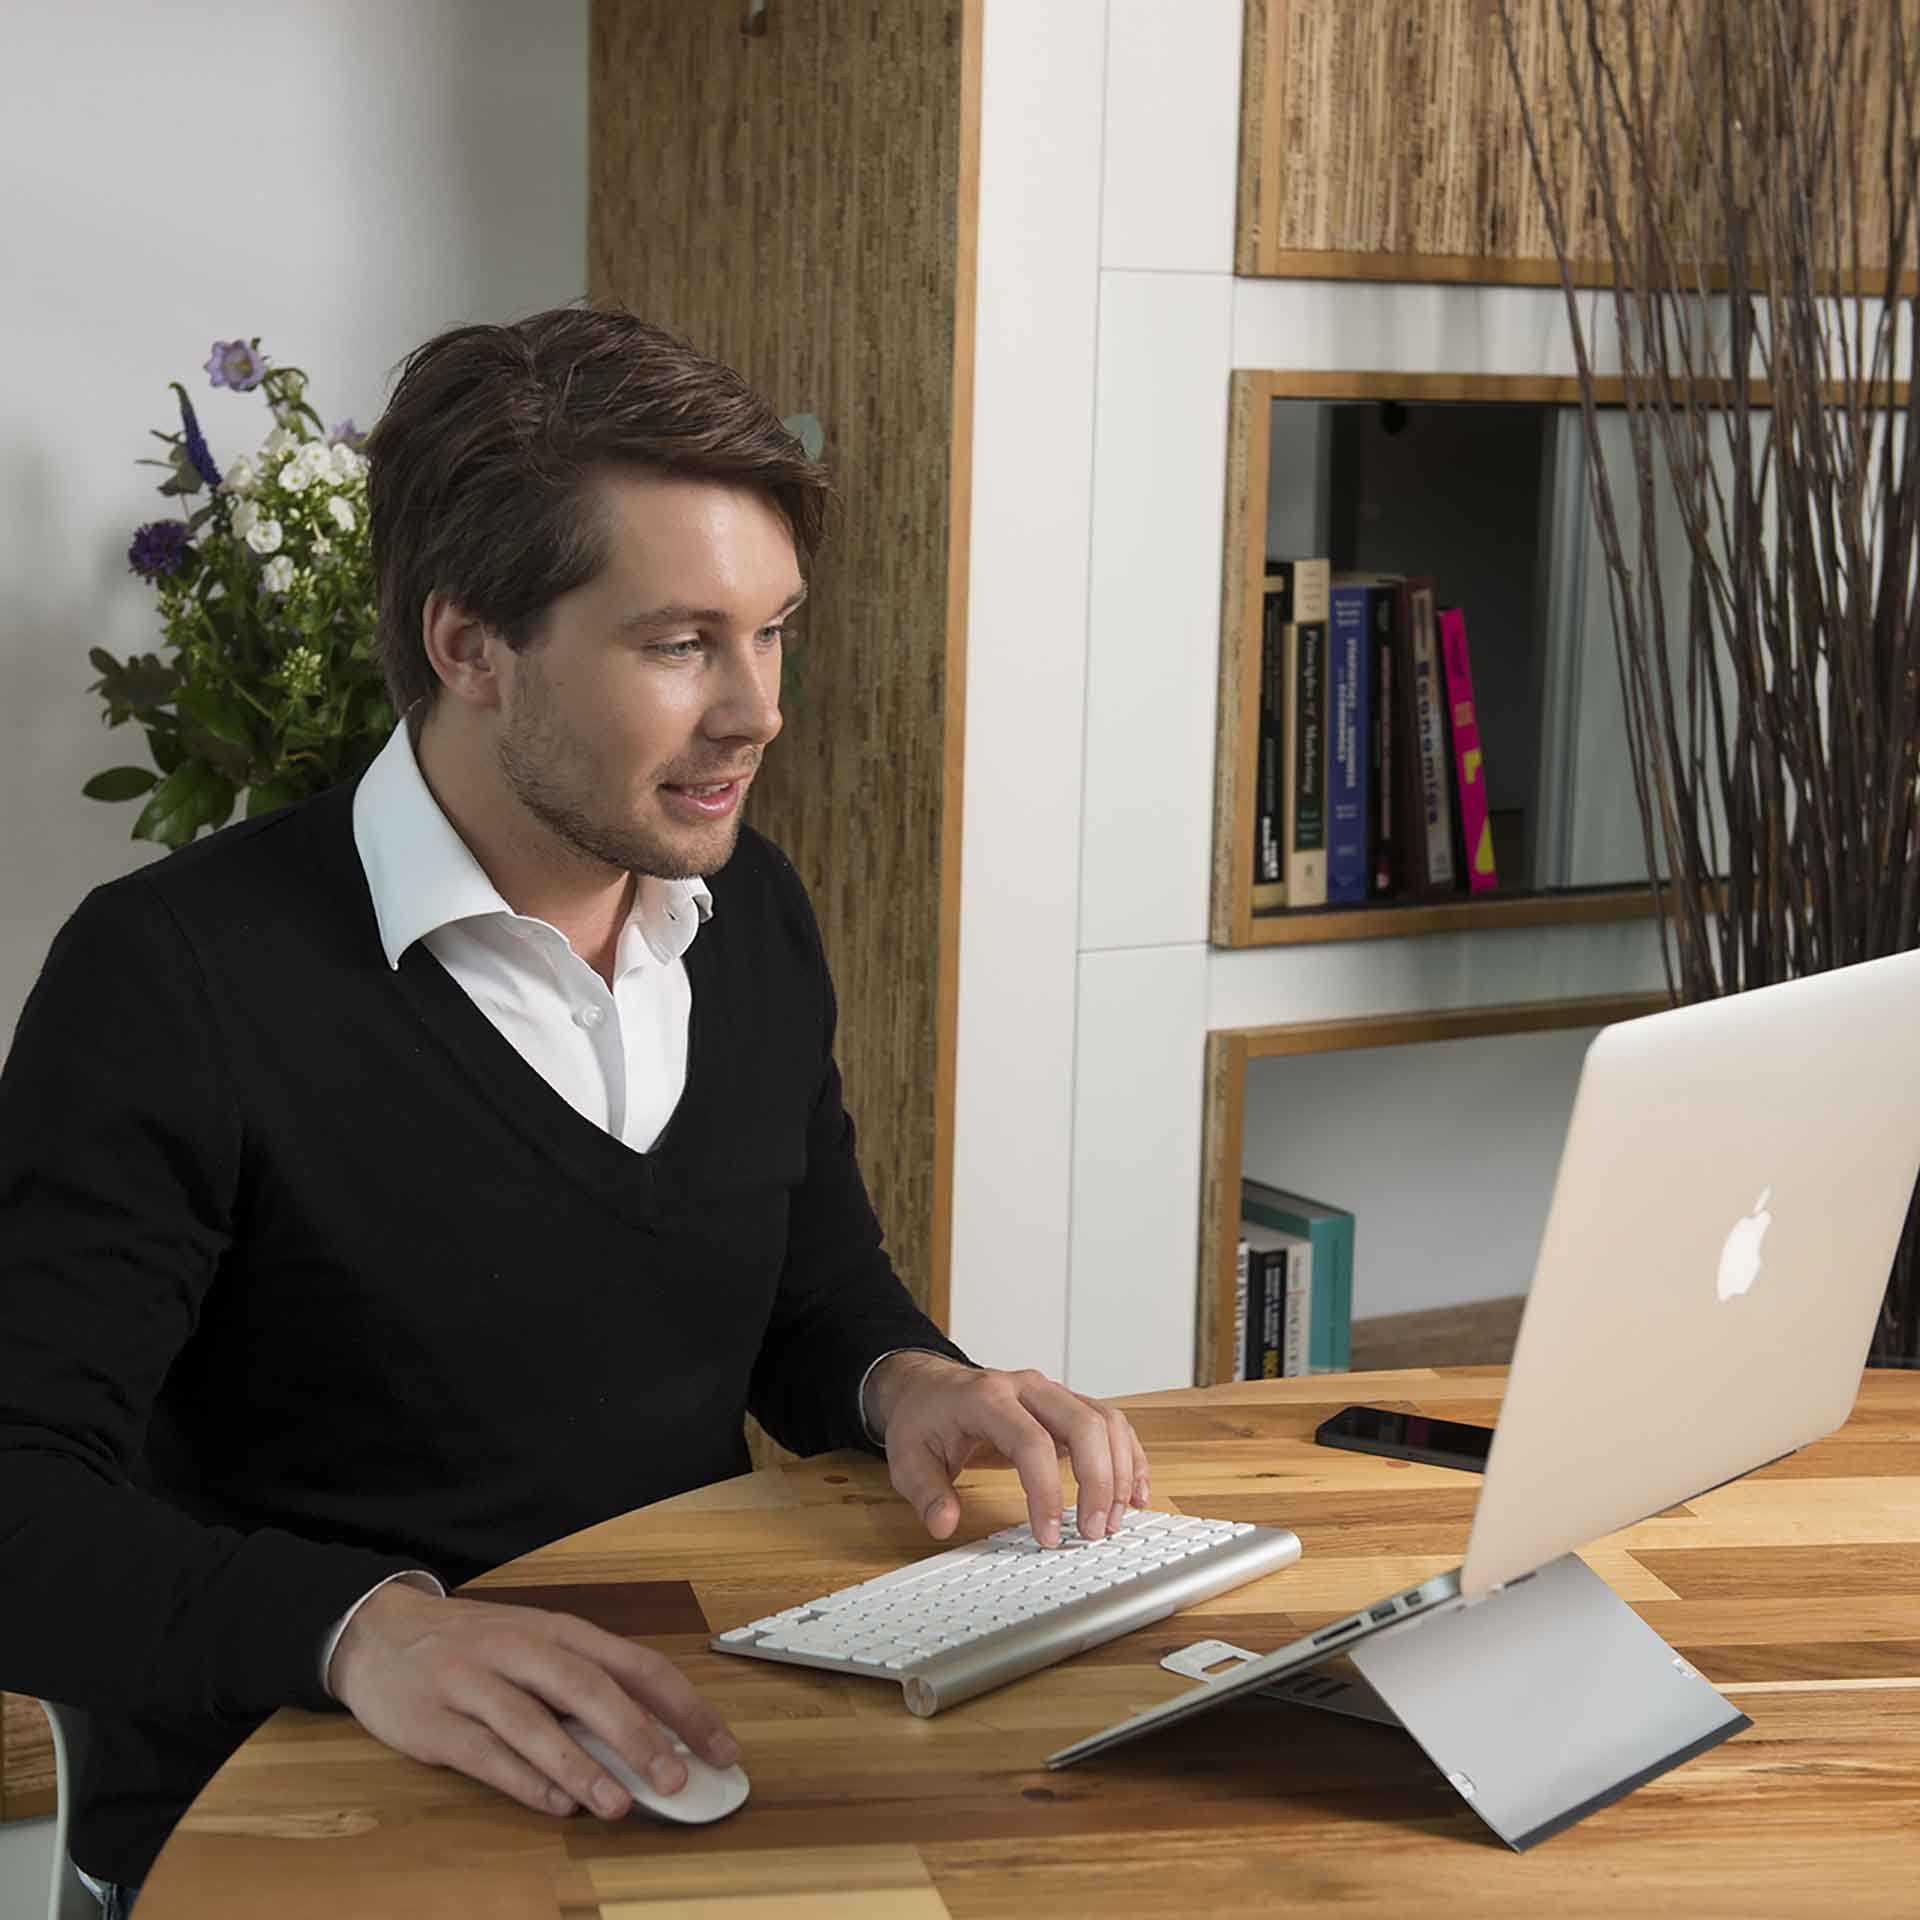 Flex top laptophouder ERKAFTO30 0000s 0005 Omgeving